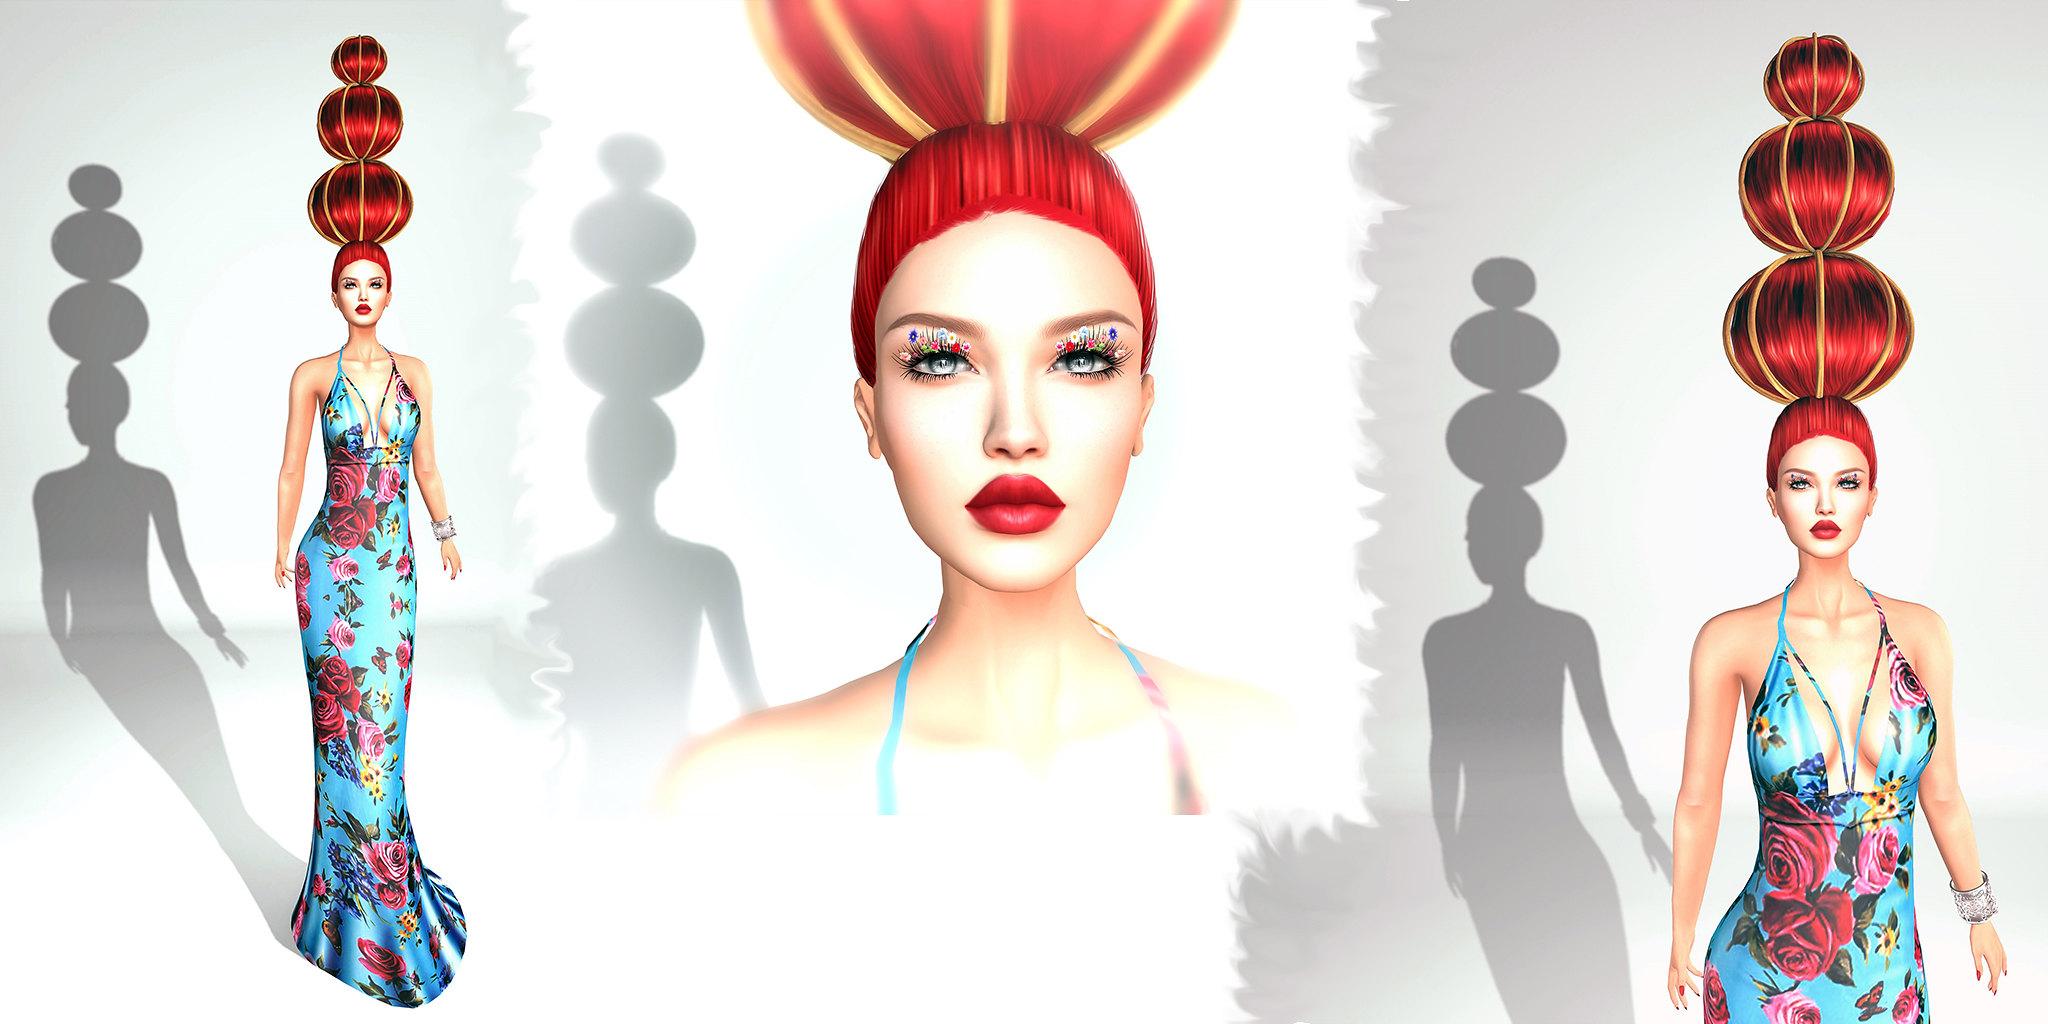 LuceMia - DE.Boutique & Indulge Temptation! & P O E M A & {Letituier} & GLITTER Poses